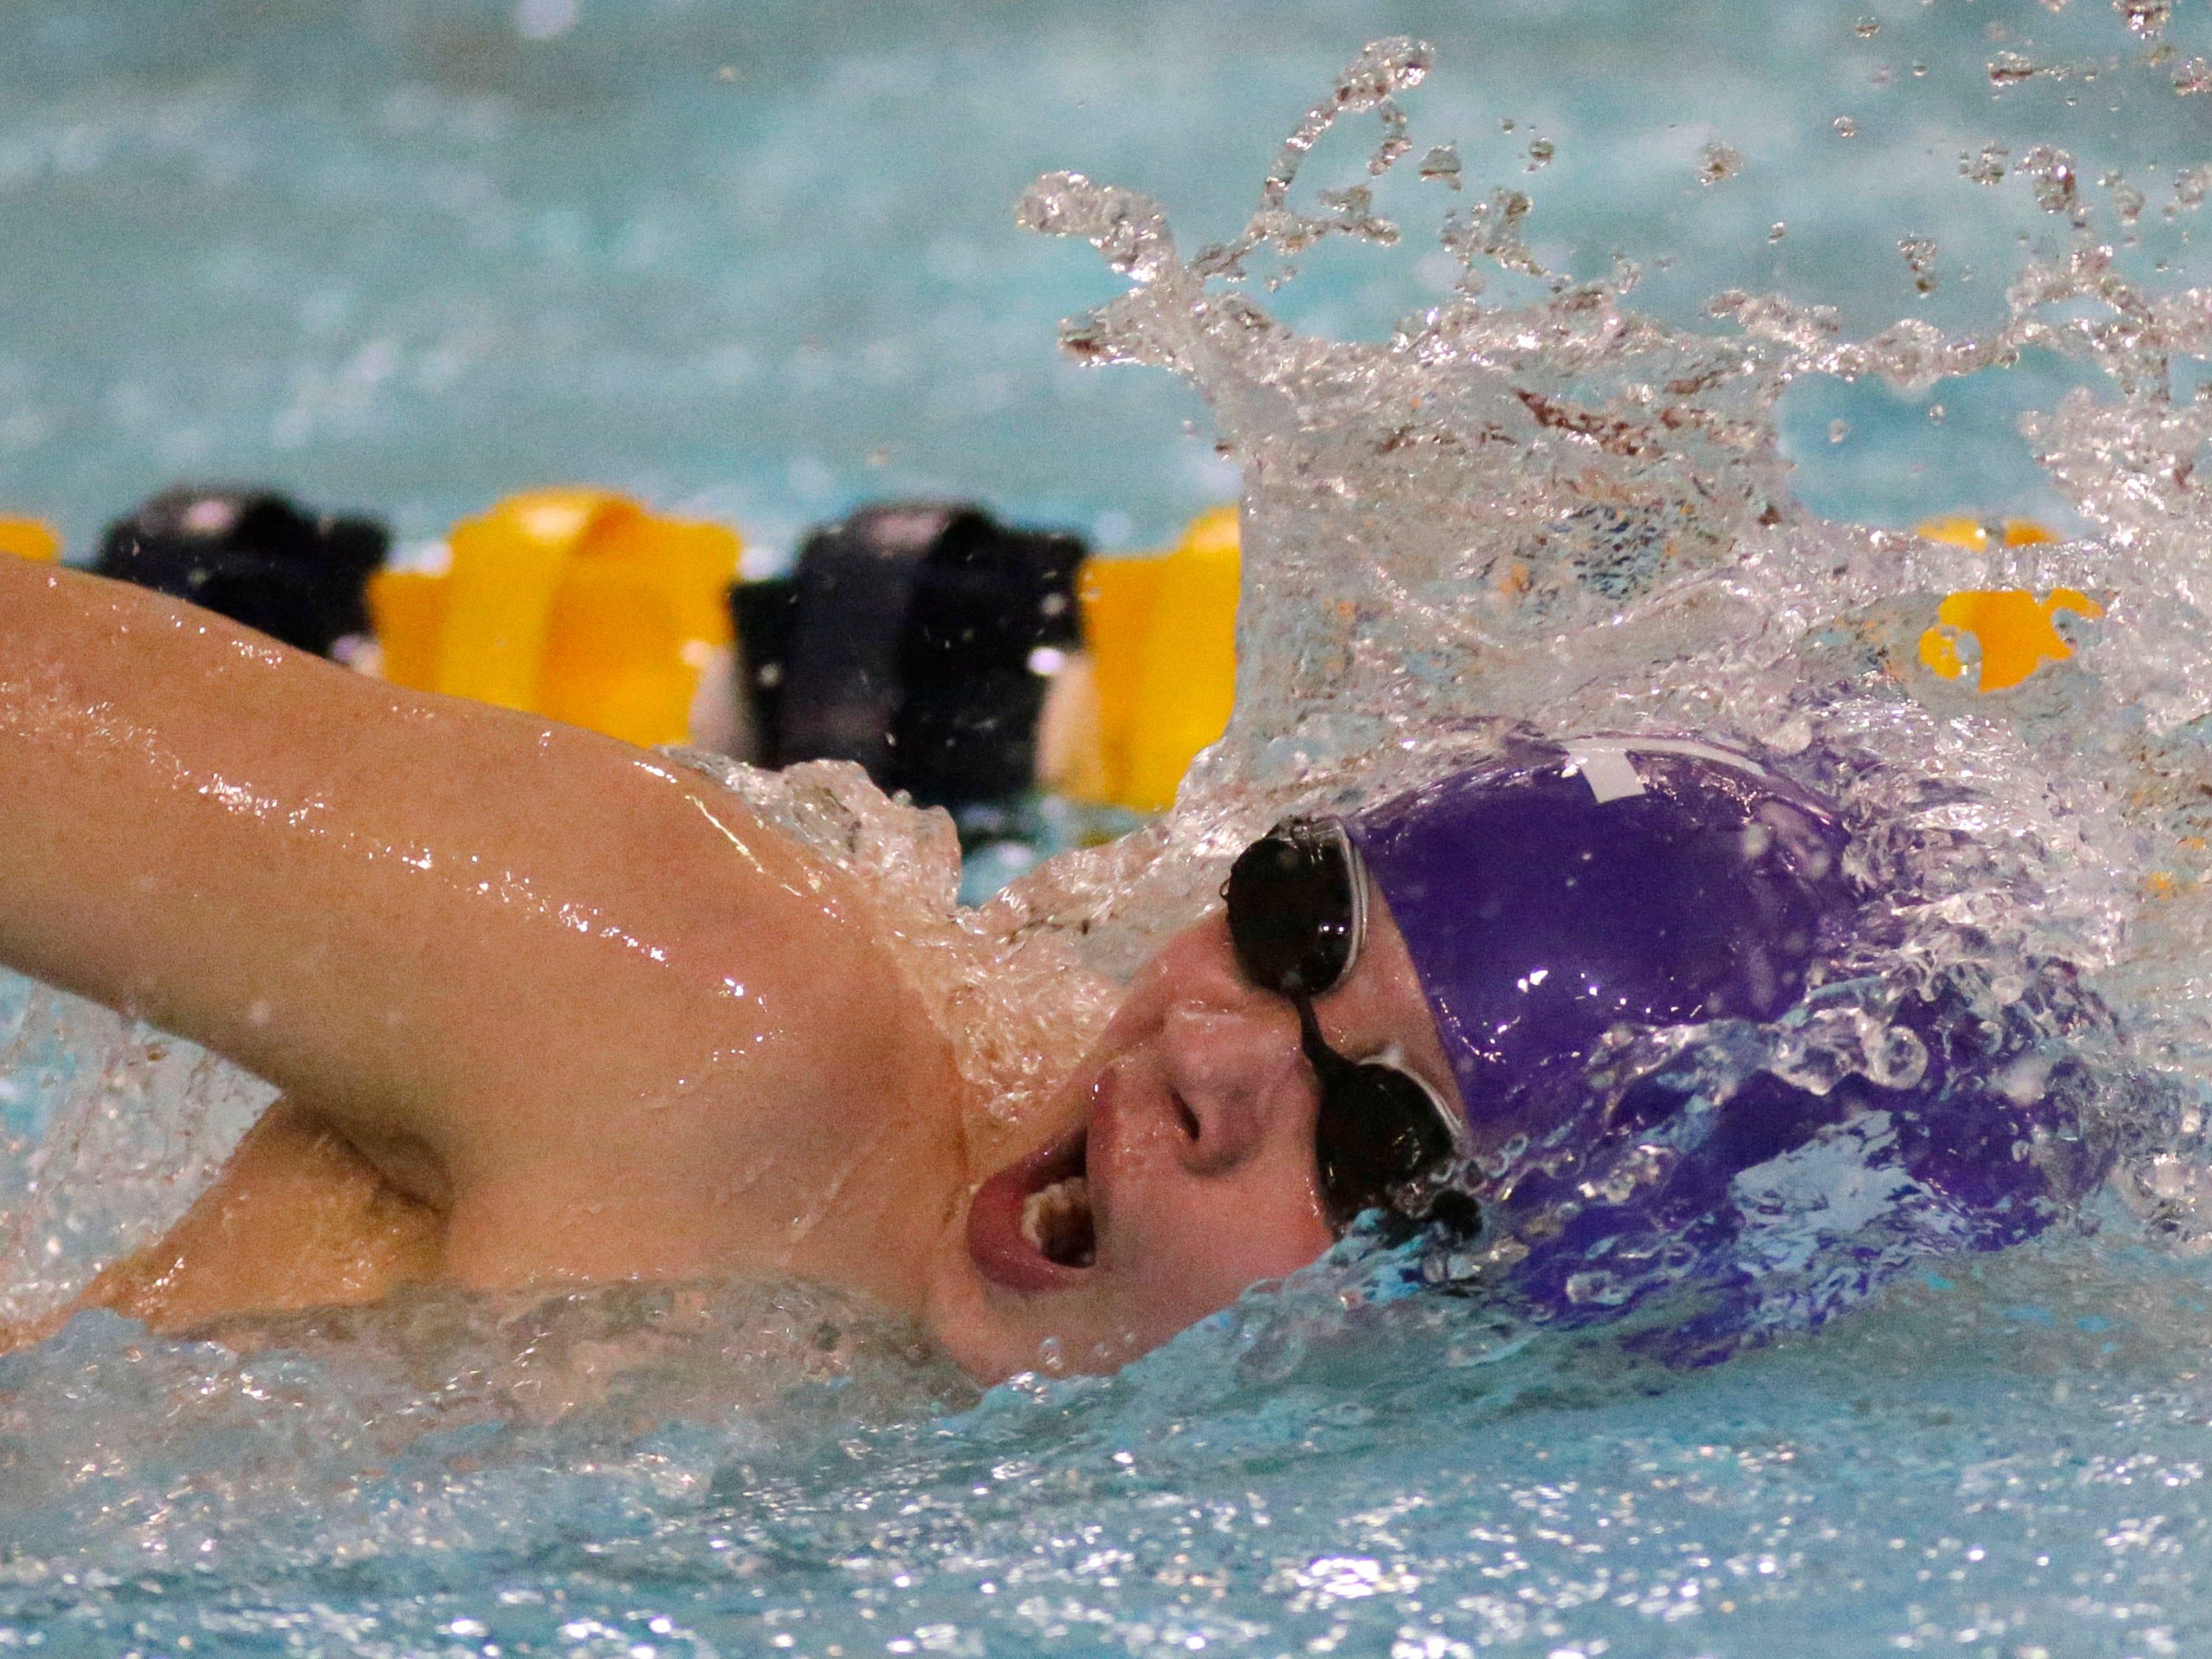 Kiel's Isaac Herr swims a relay at the Sheboygan North Raiders Relays, Saturday, January 5, 2019, in Sheboygan, Wis.